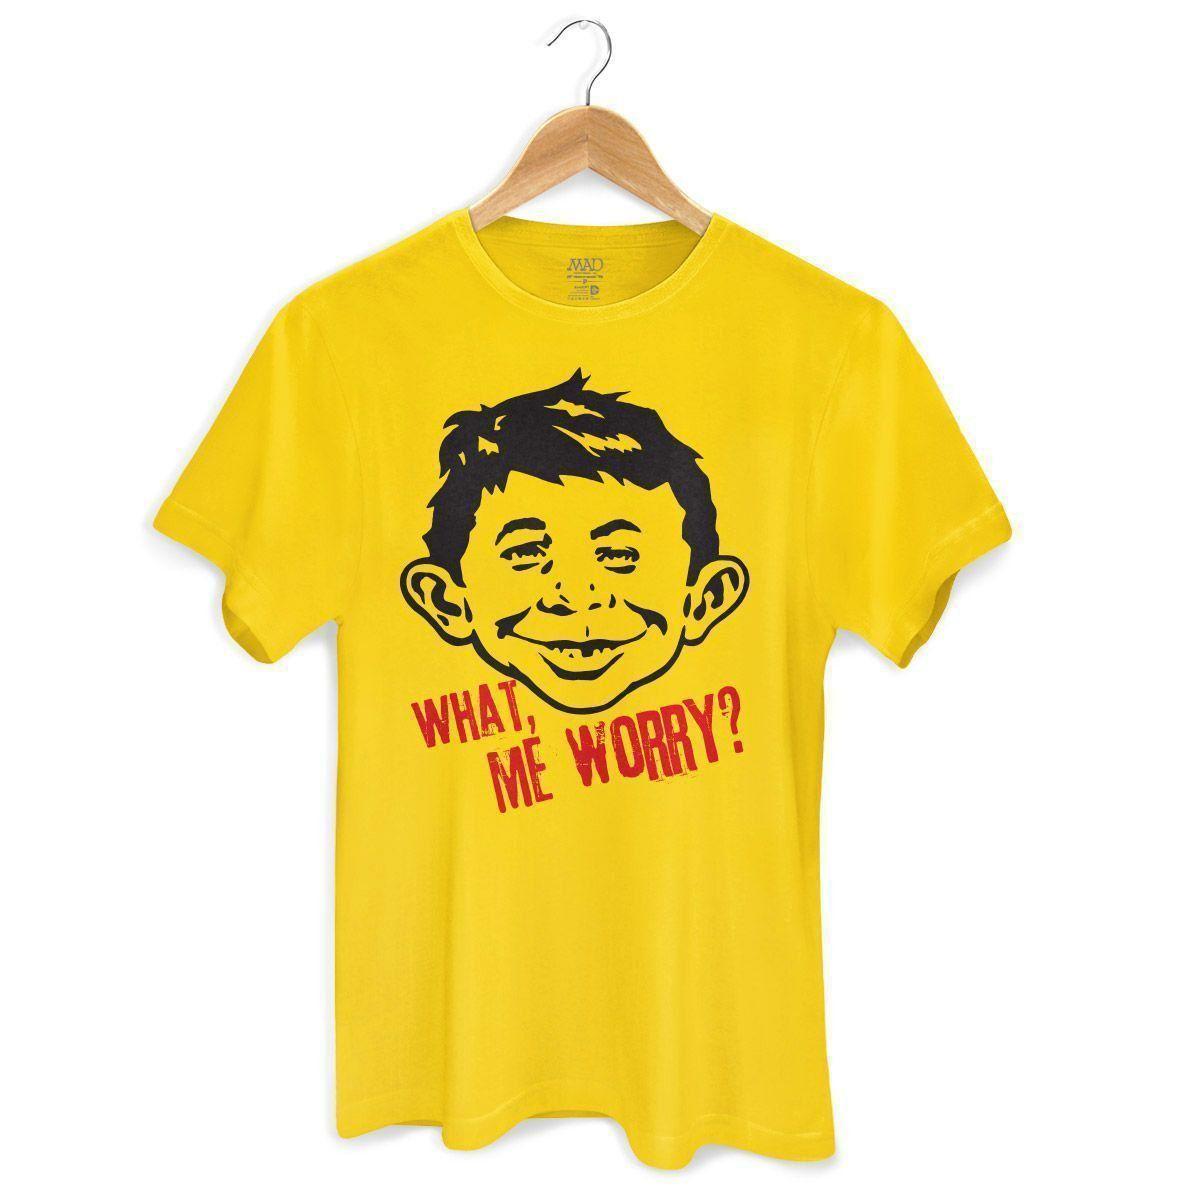 Camiseta Masculina MAD What, Me Worry? 3